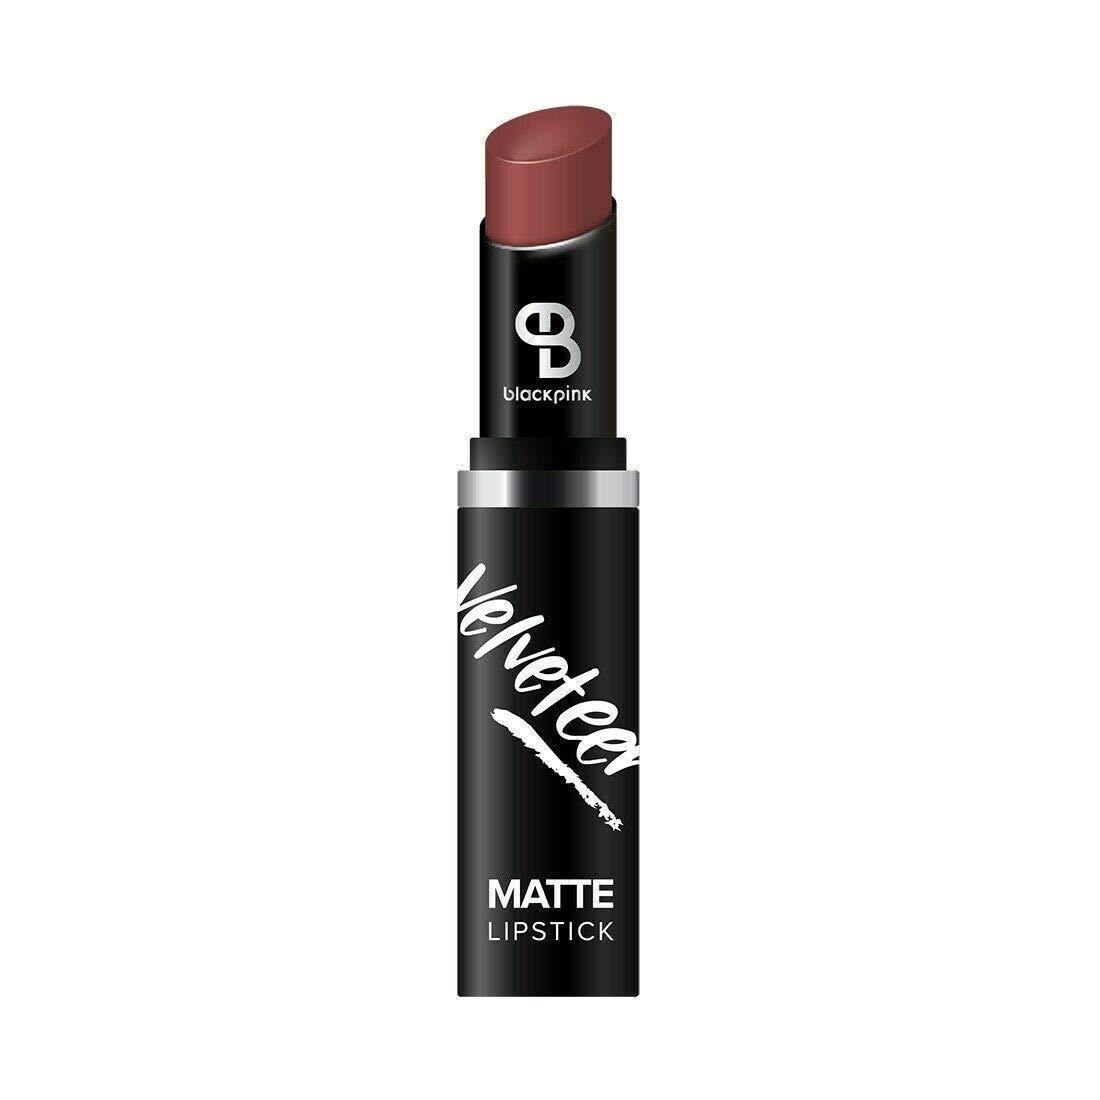 BLACKPINK - Rich Color - VELVET MATTE LIPSTICK(18 COLOR VARIATIONS) FLIRTATIOUS, PLAYFUL, SEXY, VIBRATE SHADES (TIRAMISU)